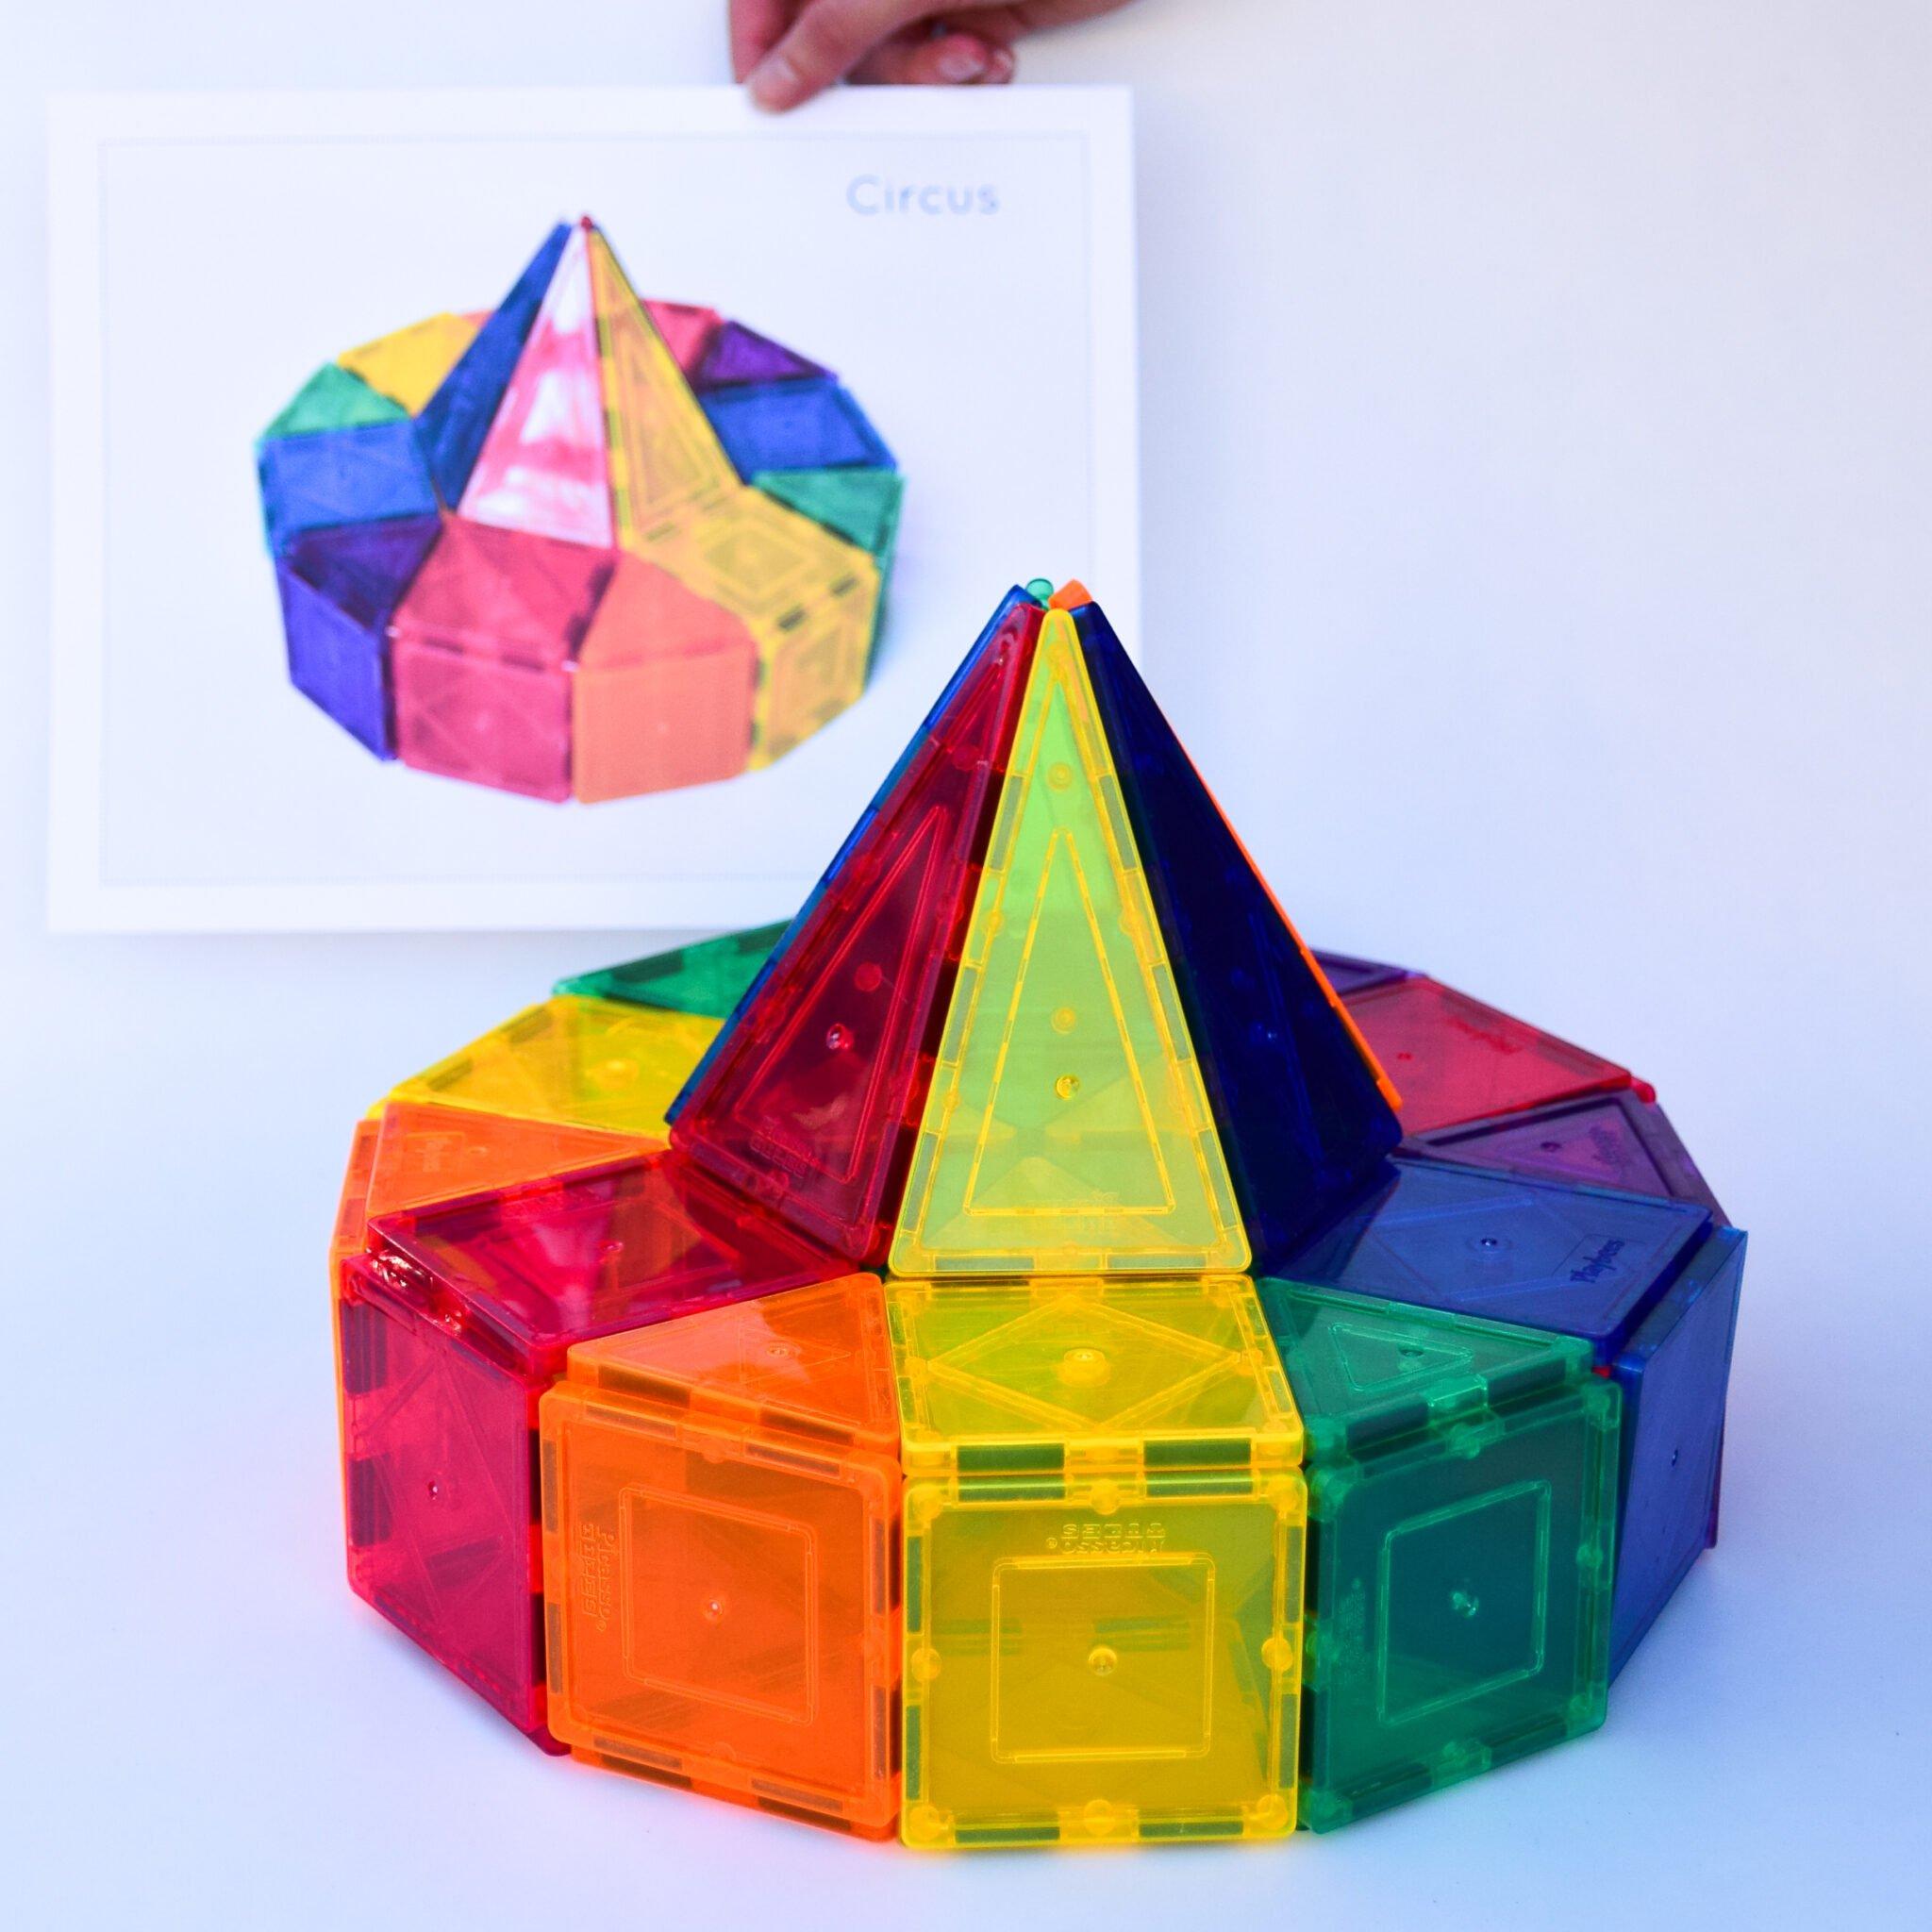 Magnetic Tiles Idea Cards 3d Creative Designs Adventure In A Box